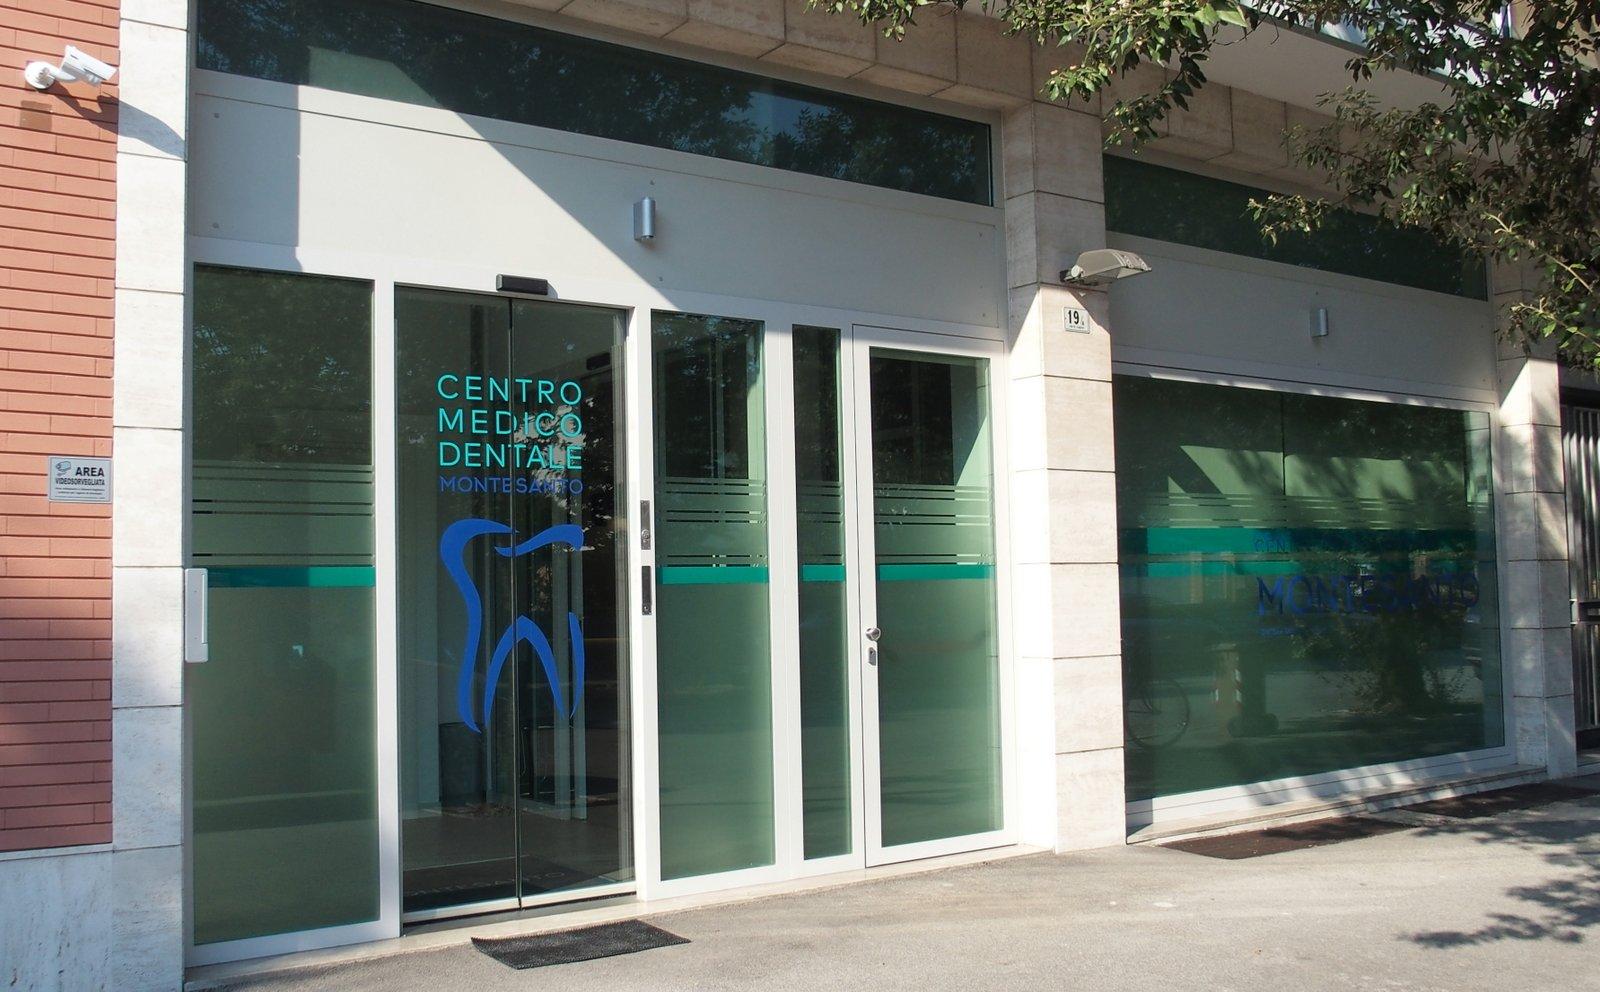 Centro Medico Dentale Montesanto